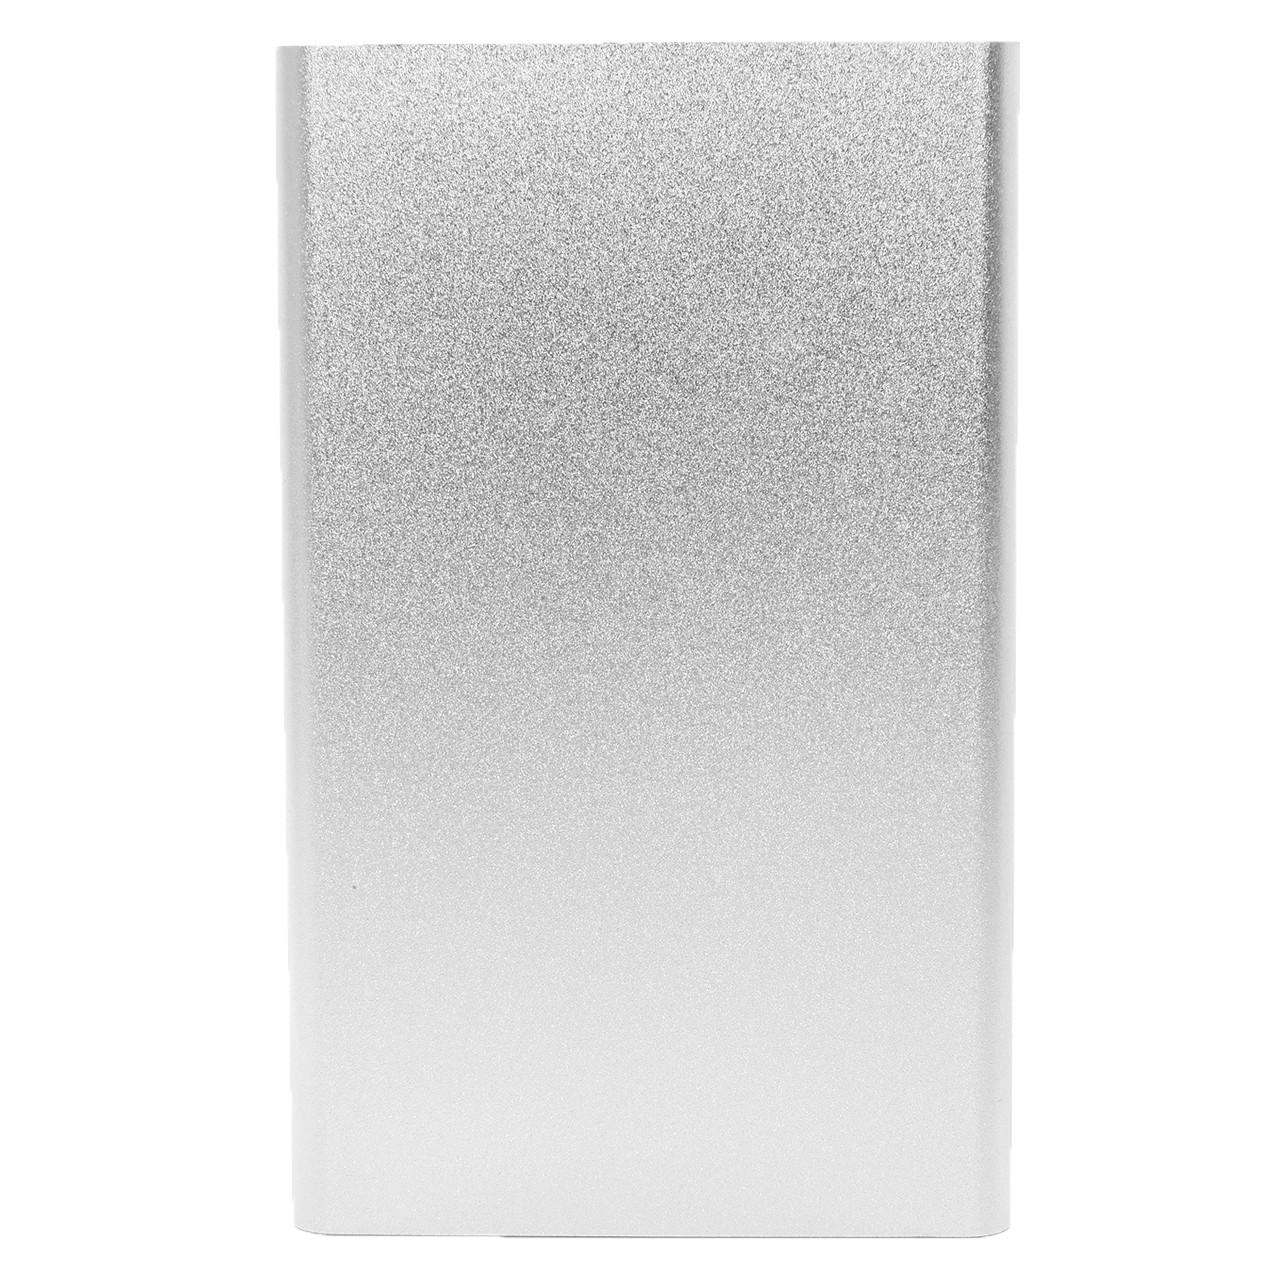 Внешний аккумулятор Power bank Strong PB-201 4000 mAh ультратонкий Silver (1029-10397)